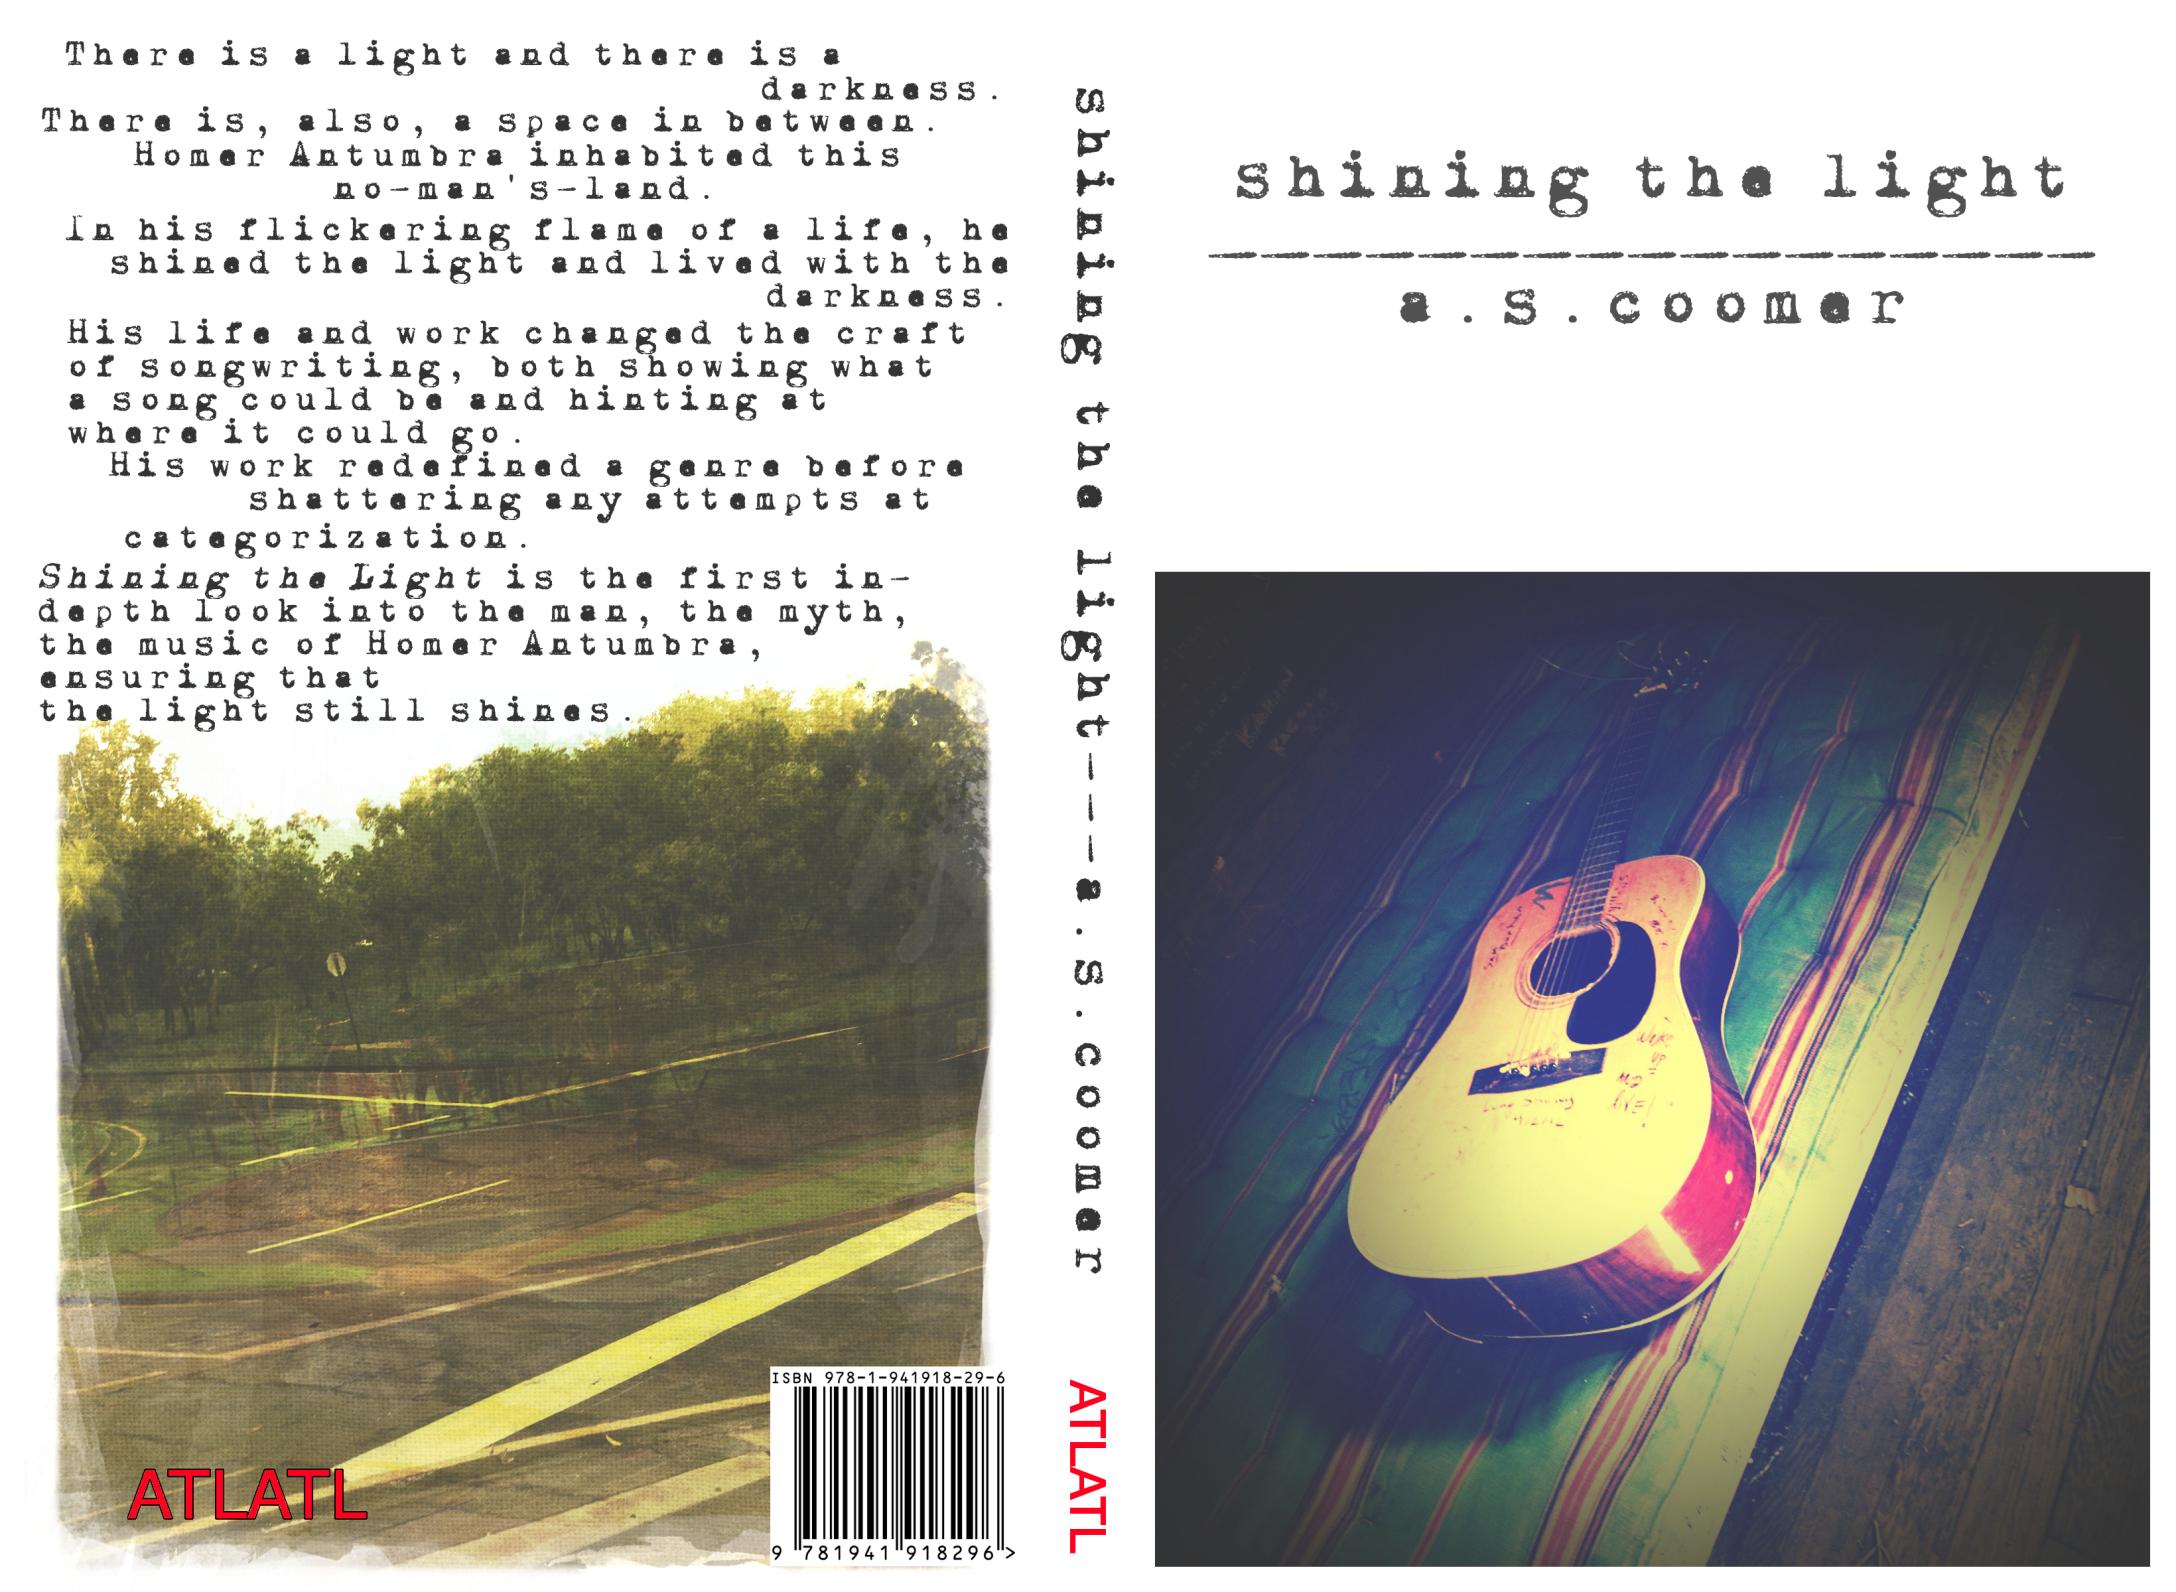 Shining the Light full jacket cover.jpeg